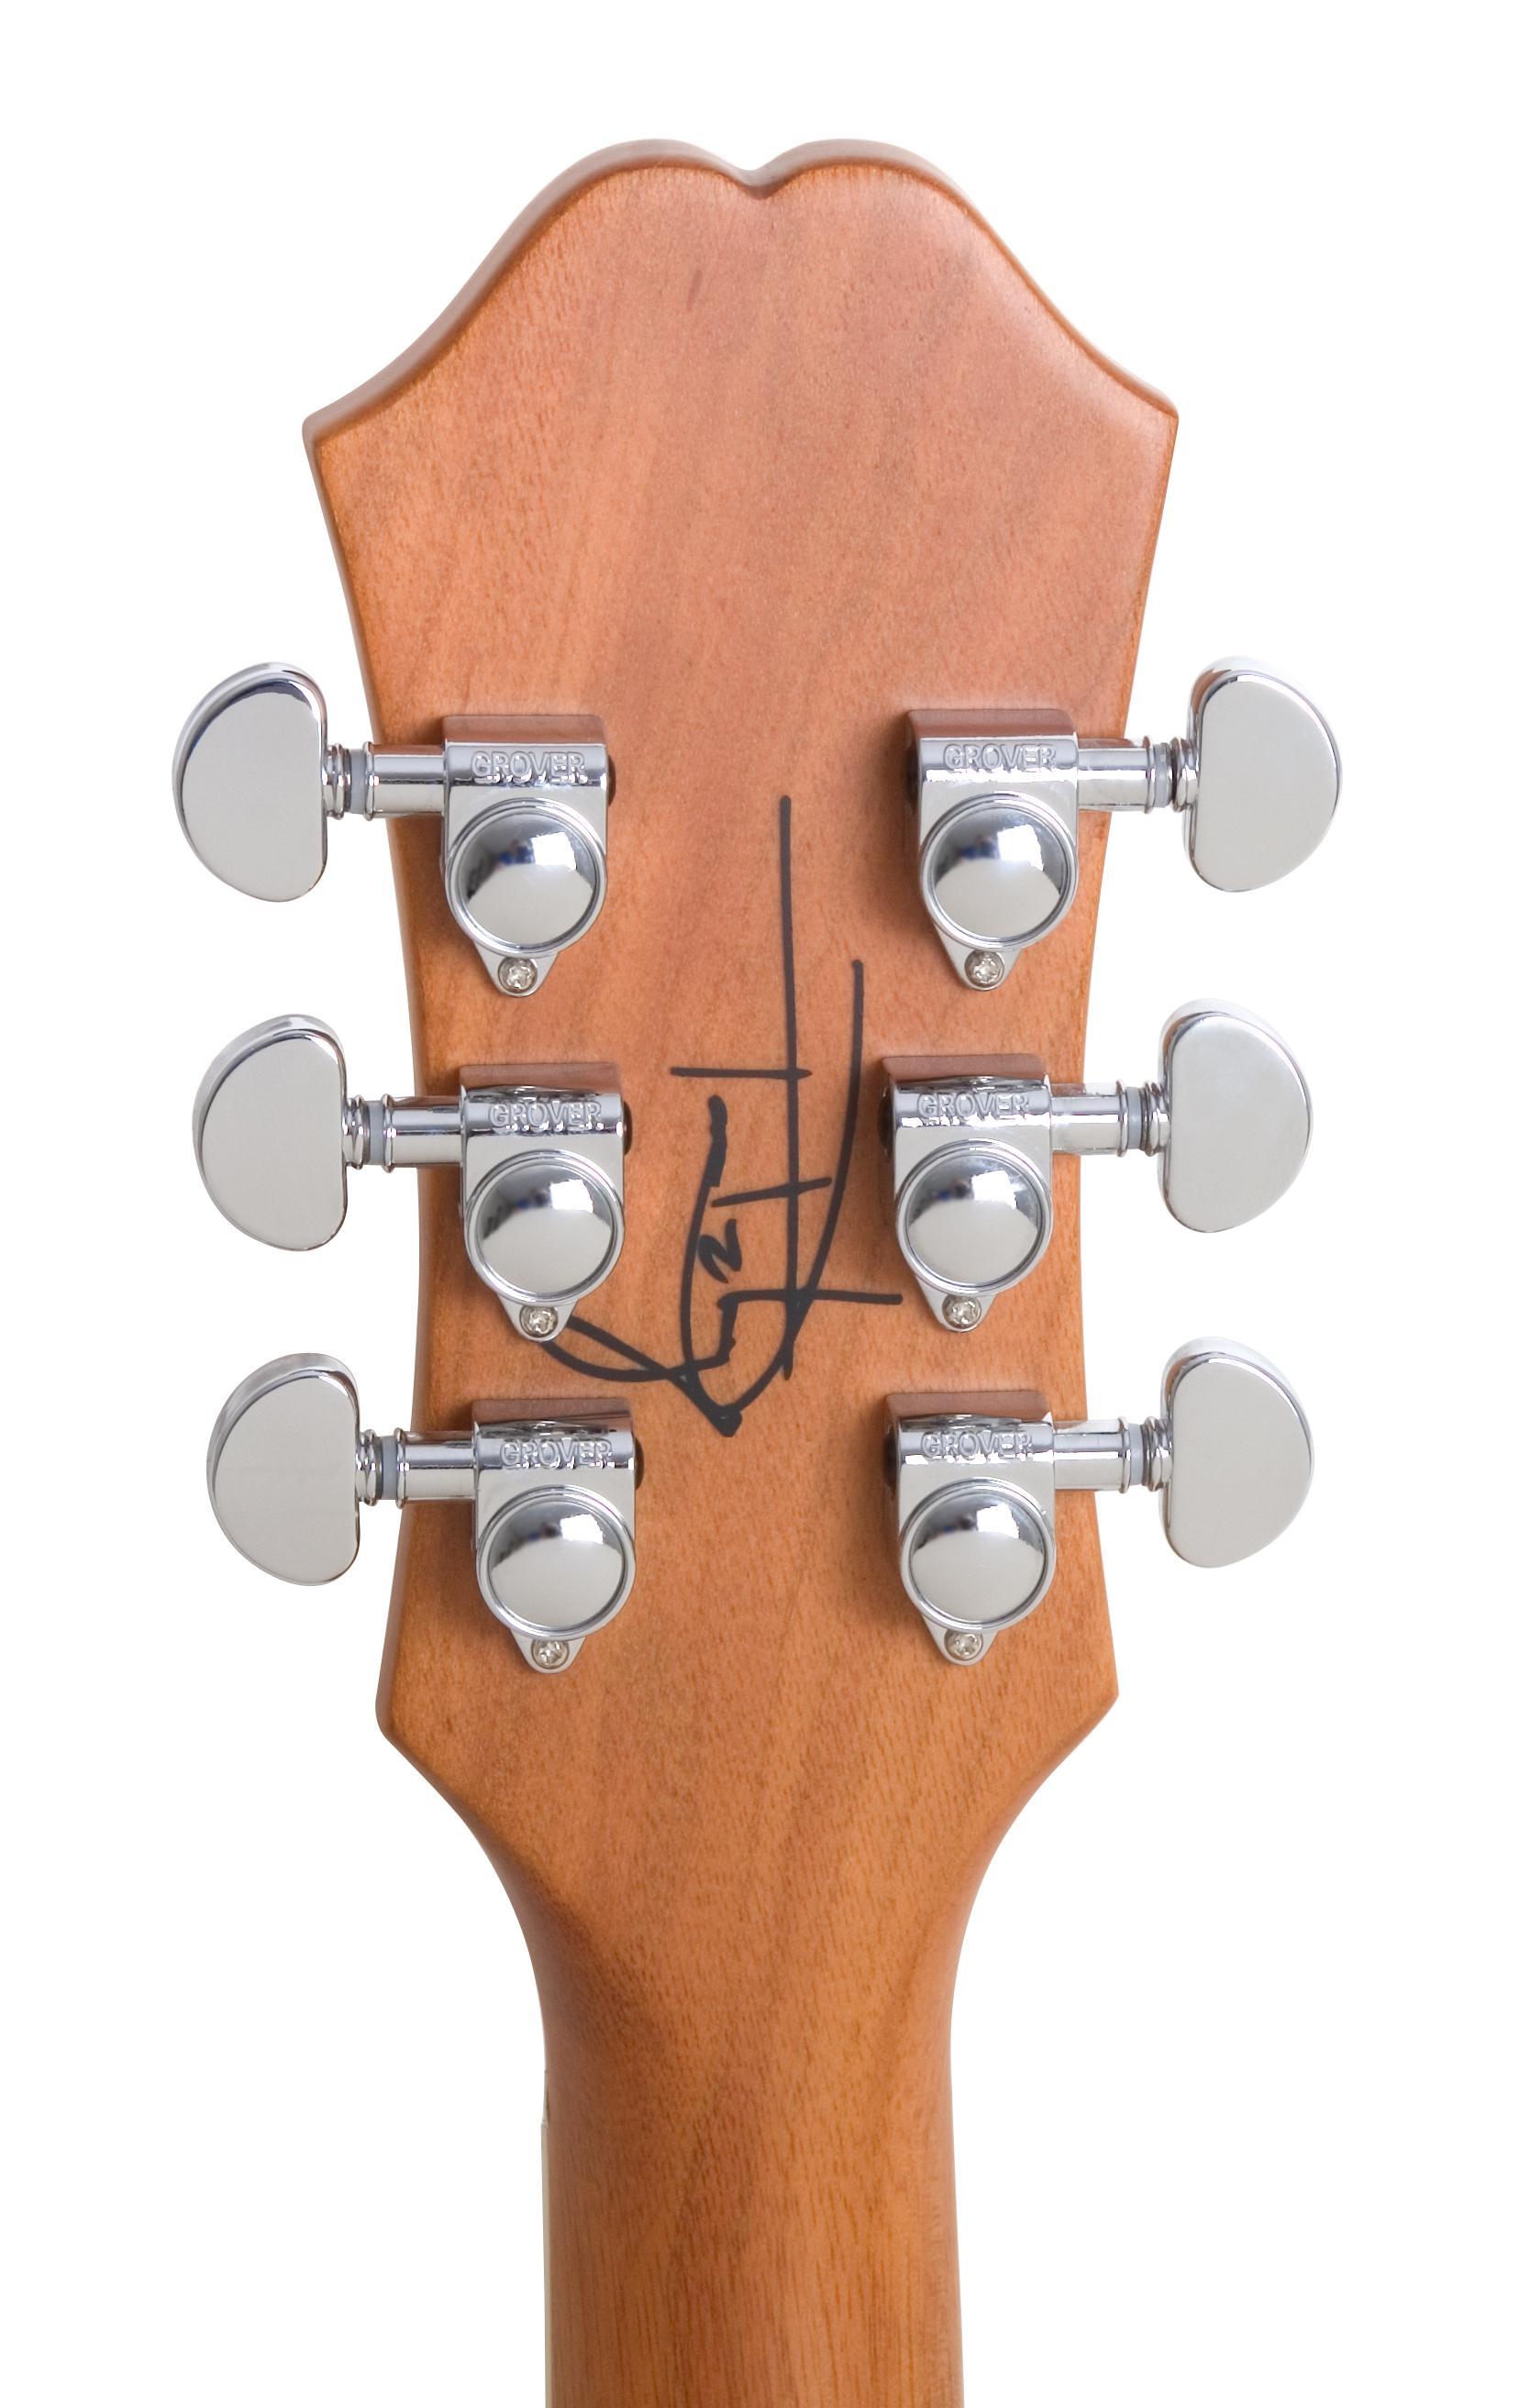 epiphone tom delonge signature es 333 semi hollowbody electric guitar musical. Black Bedroom Furniture Sets. Home Design Ideas